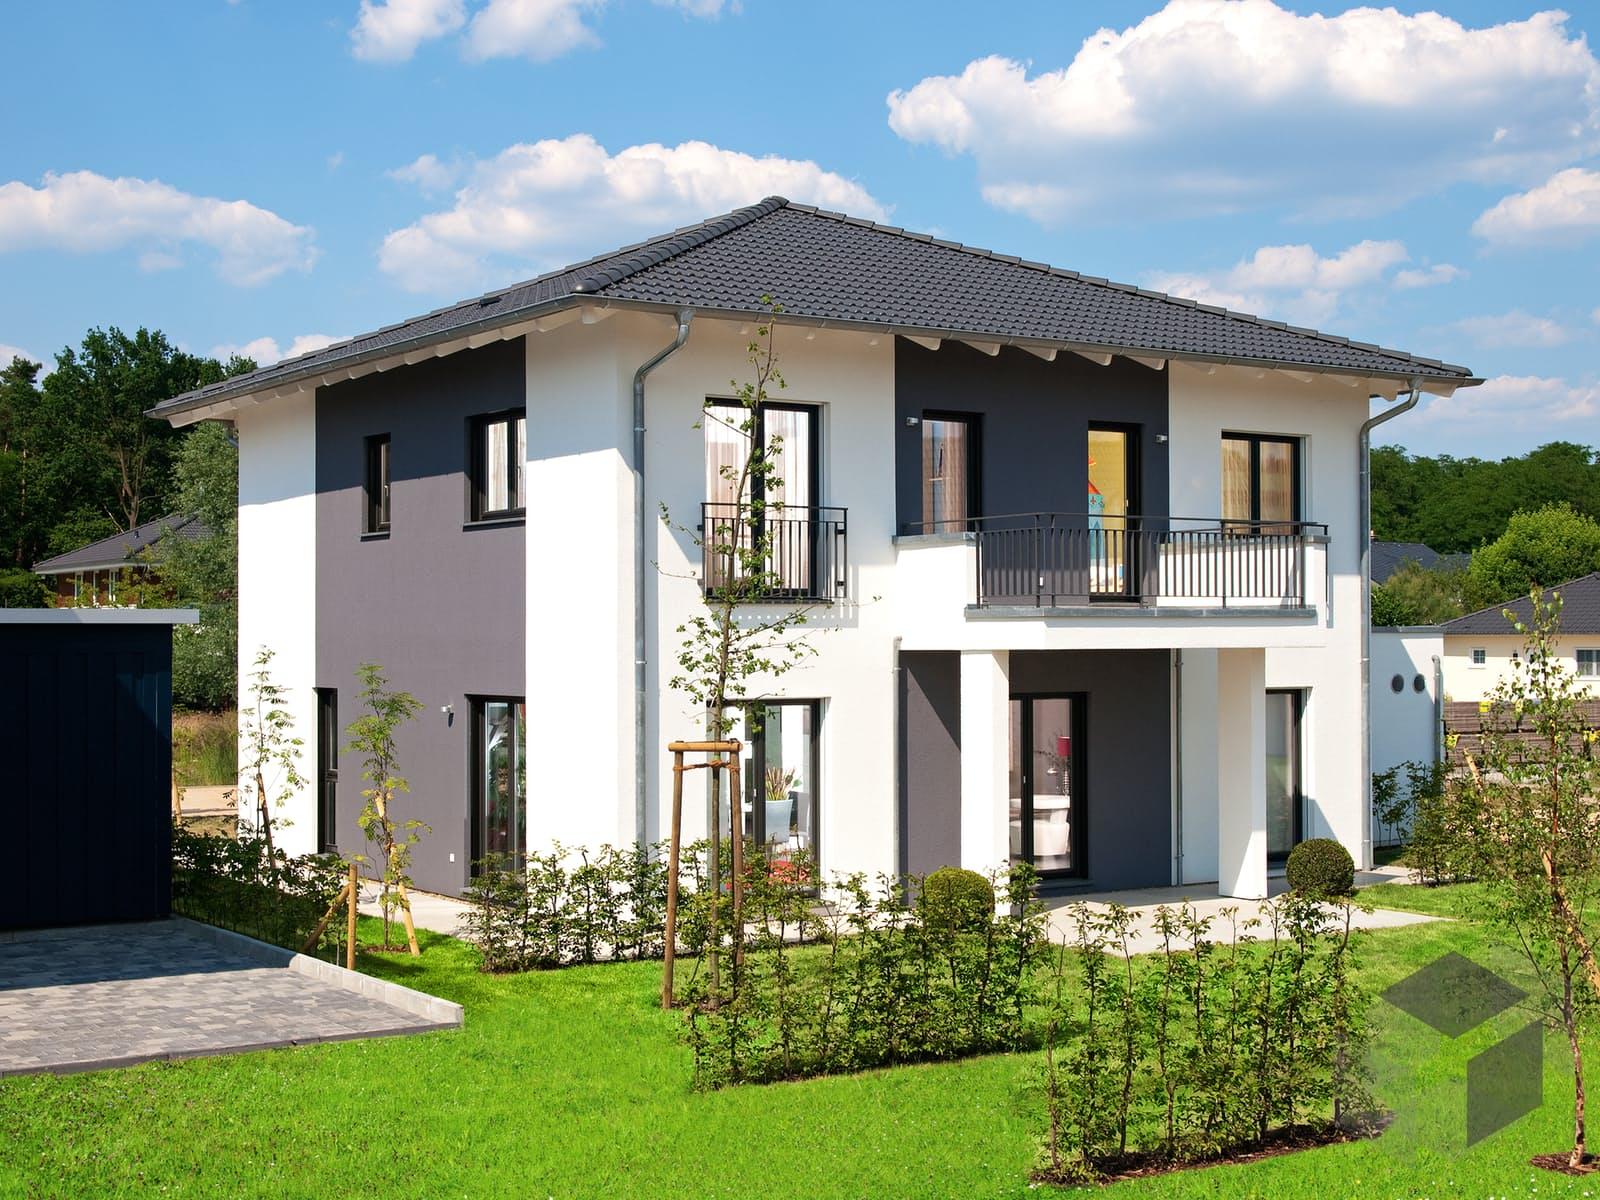 ausstellungshaus k nigs wusterhausen citylife 500 out von weberhaus komplette. Black Bedroom Furniture Sets. Home Design Ideas